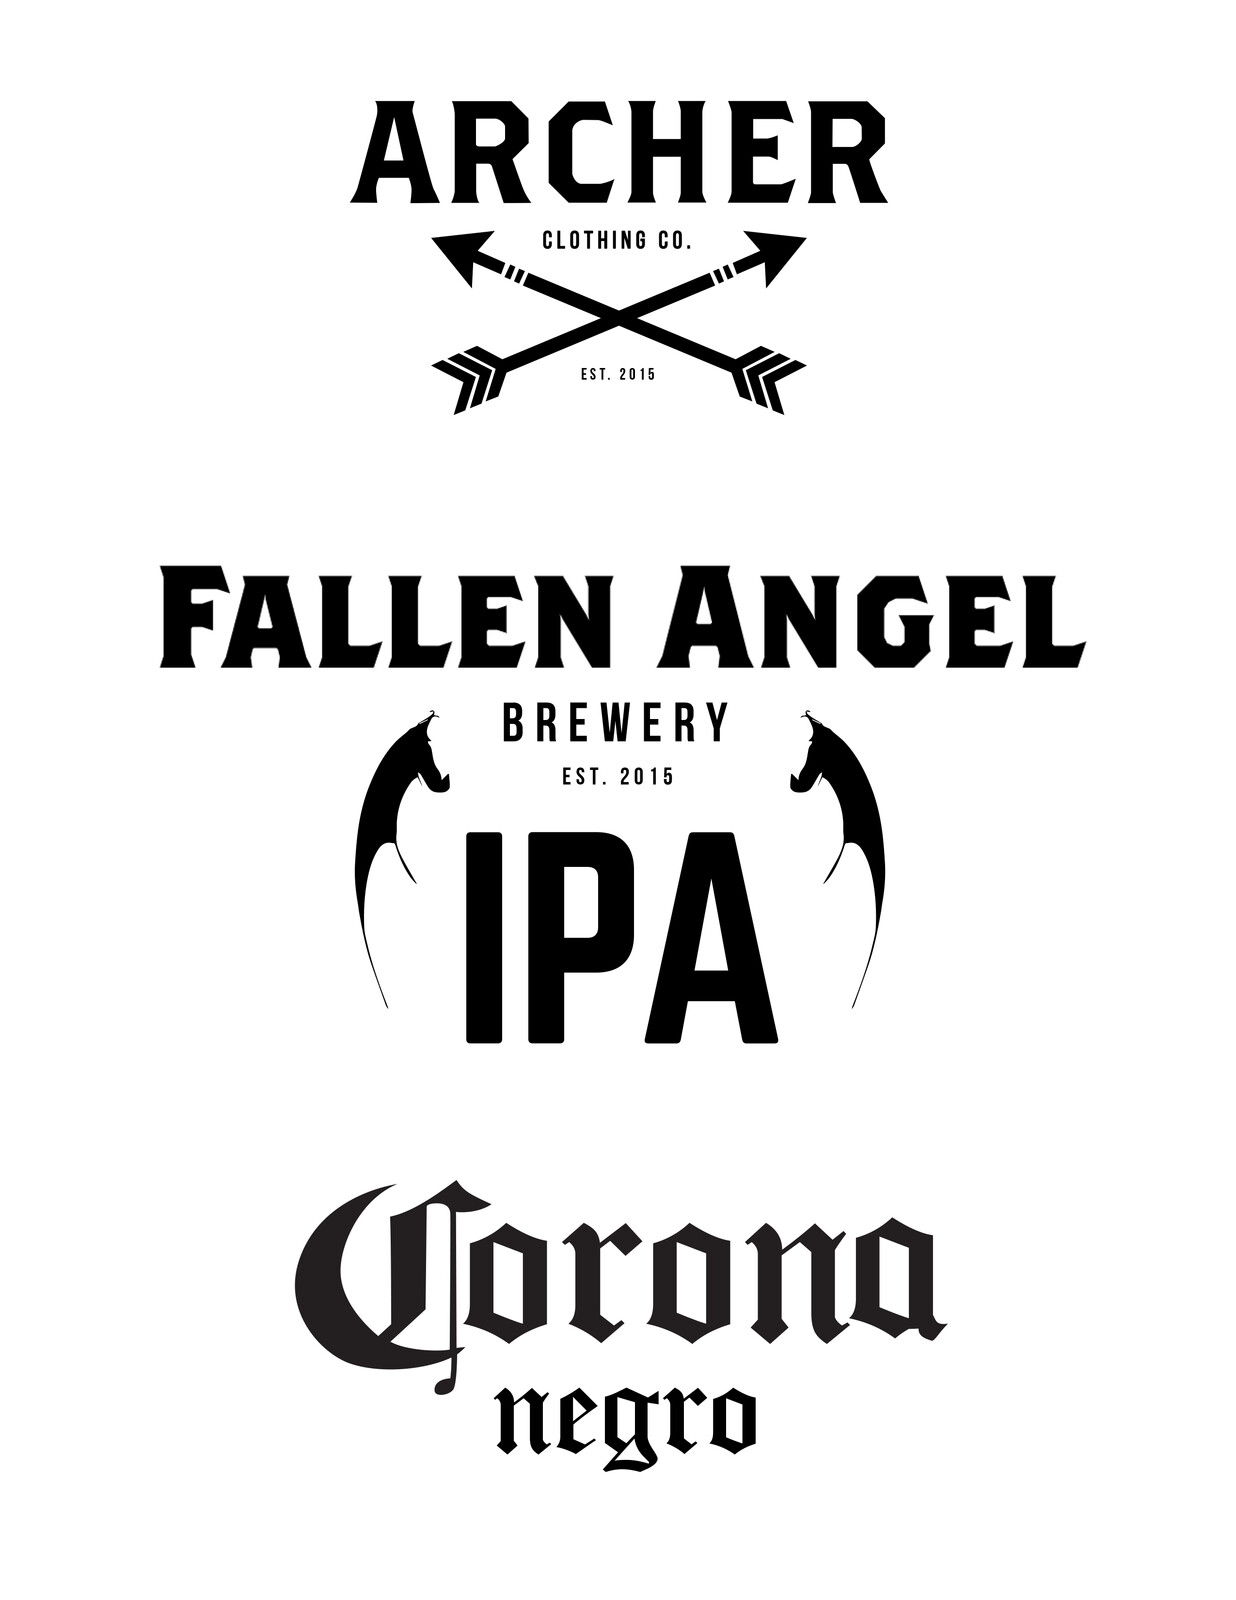 Archer Clothing / Fallen Angel IPA / Corona Negro